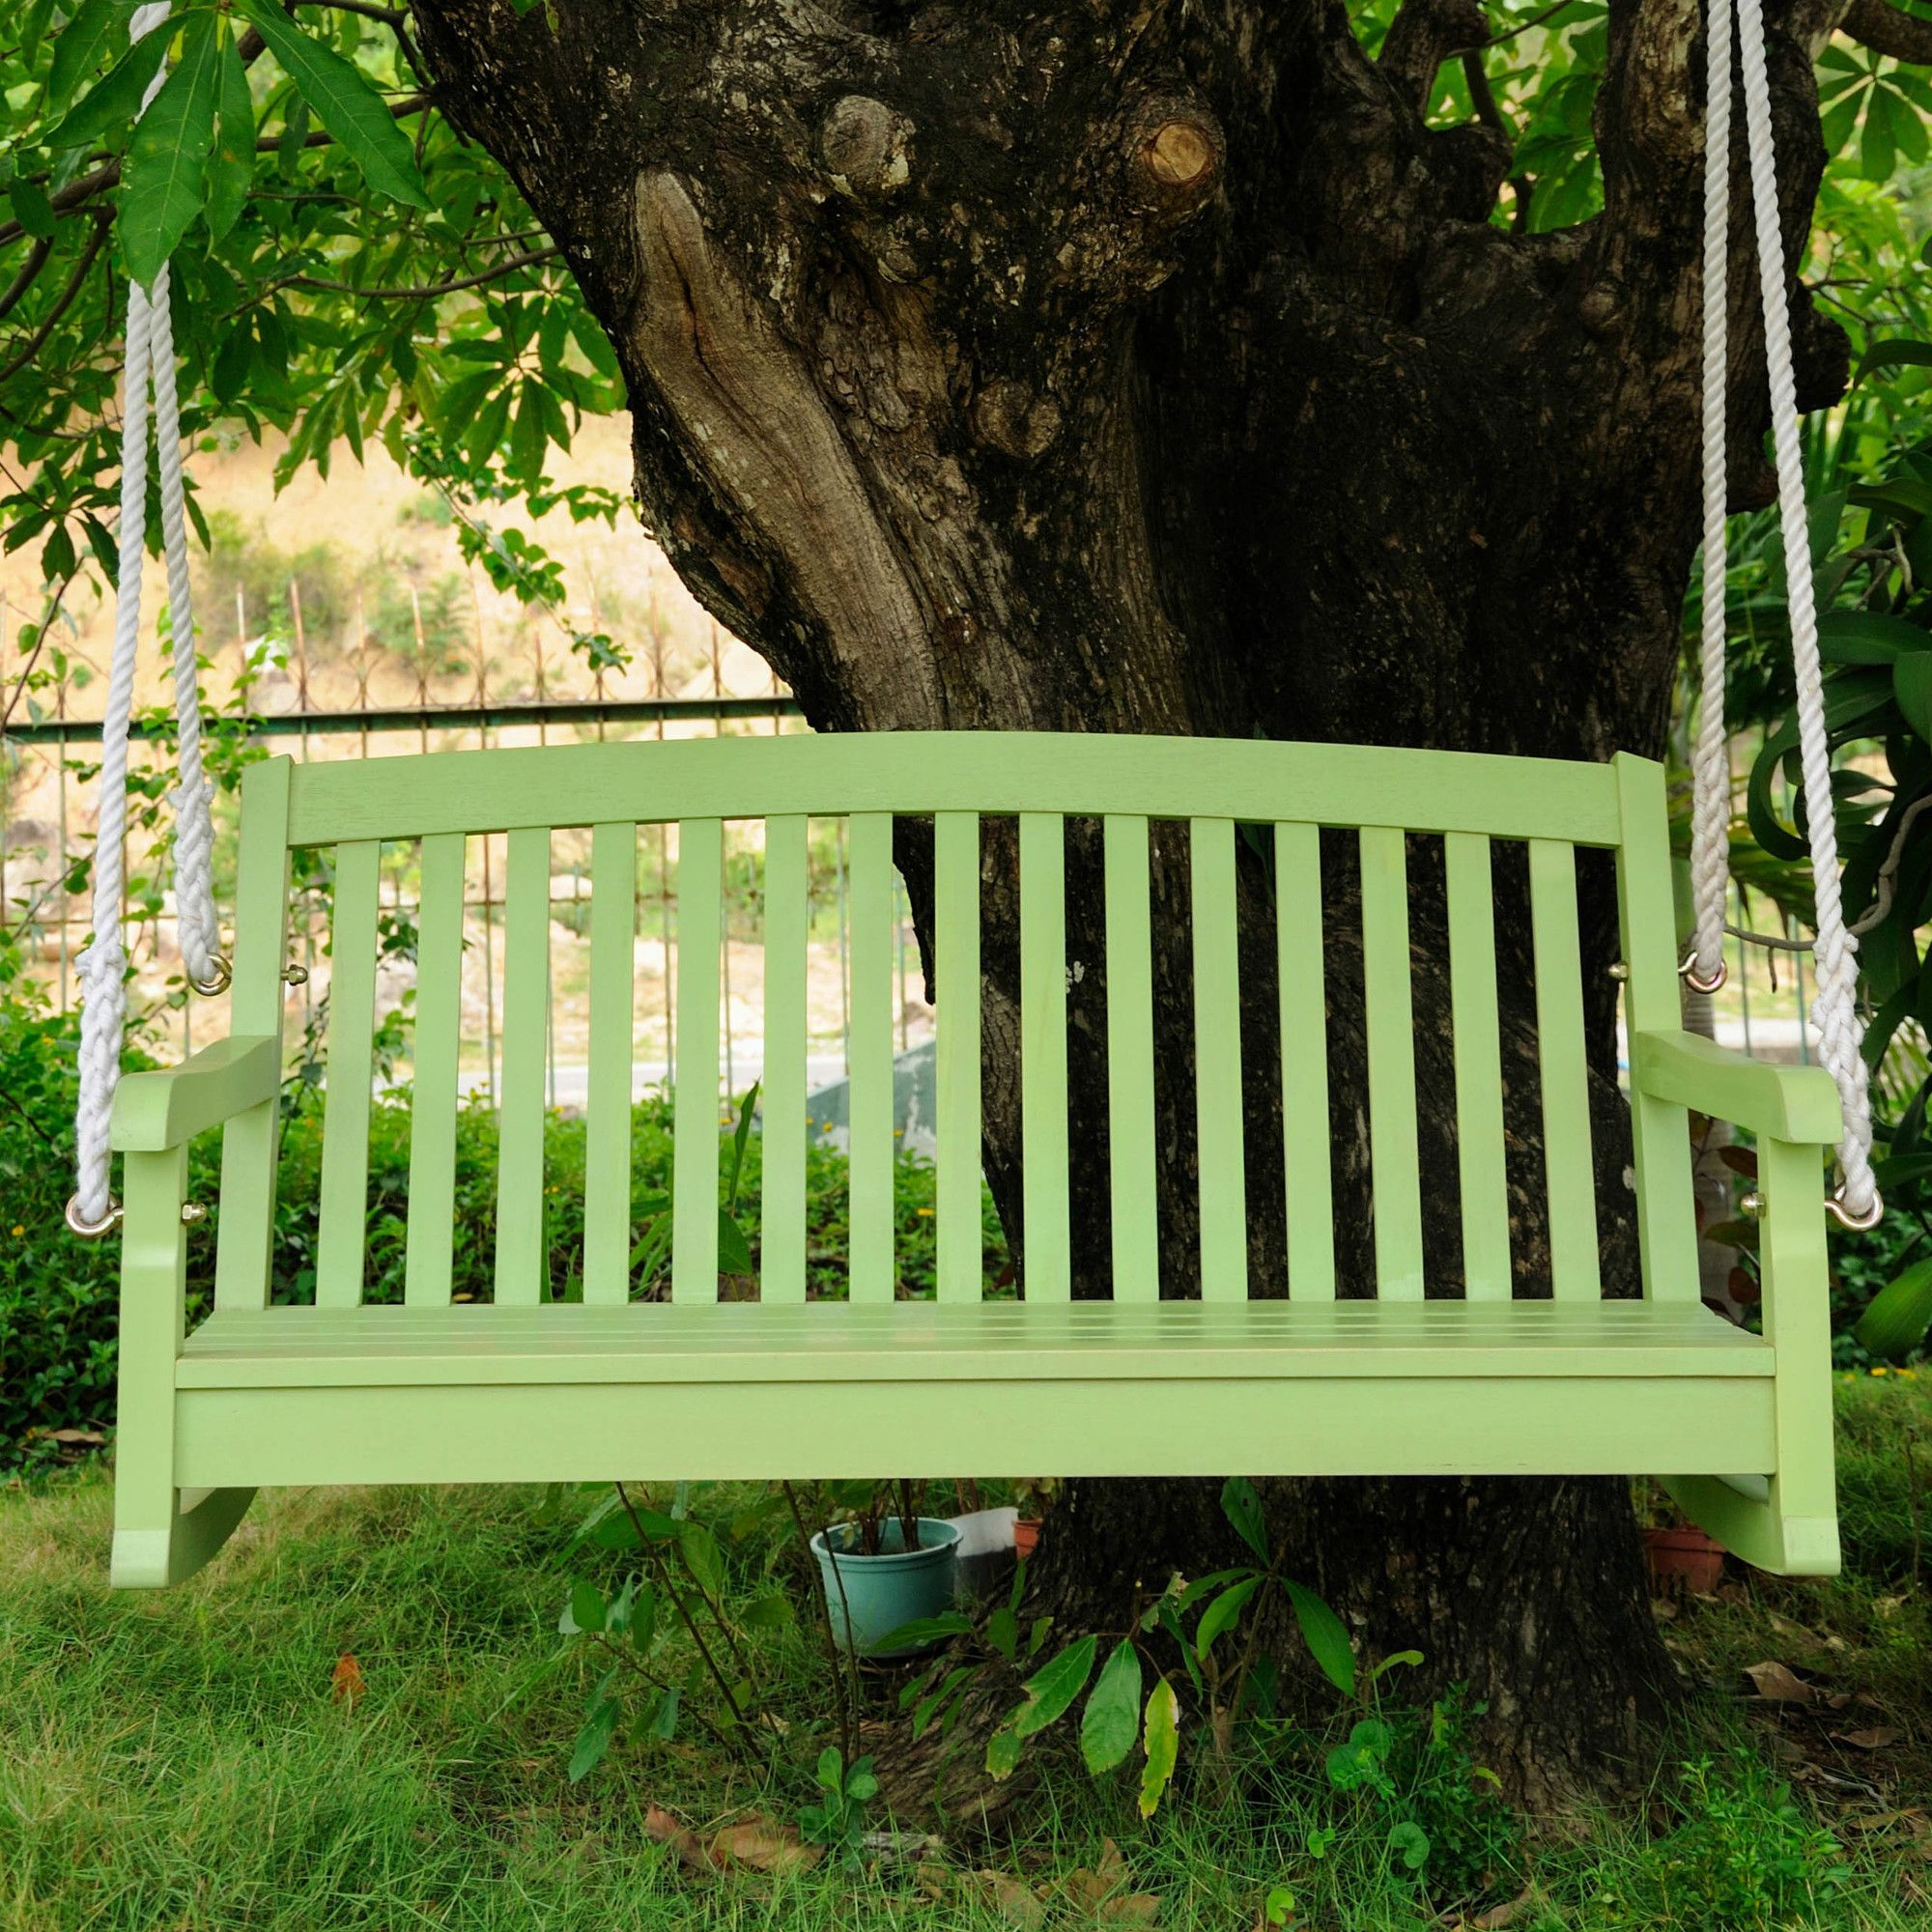 Bristol Porch Swing In 2020 | Porch Swing, Porch, Patio Swing Intended For Bristol Porch Swings (View 7 of 25)